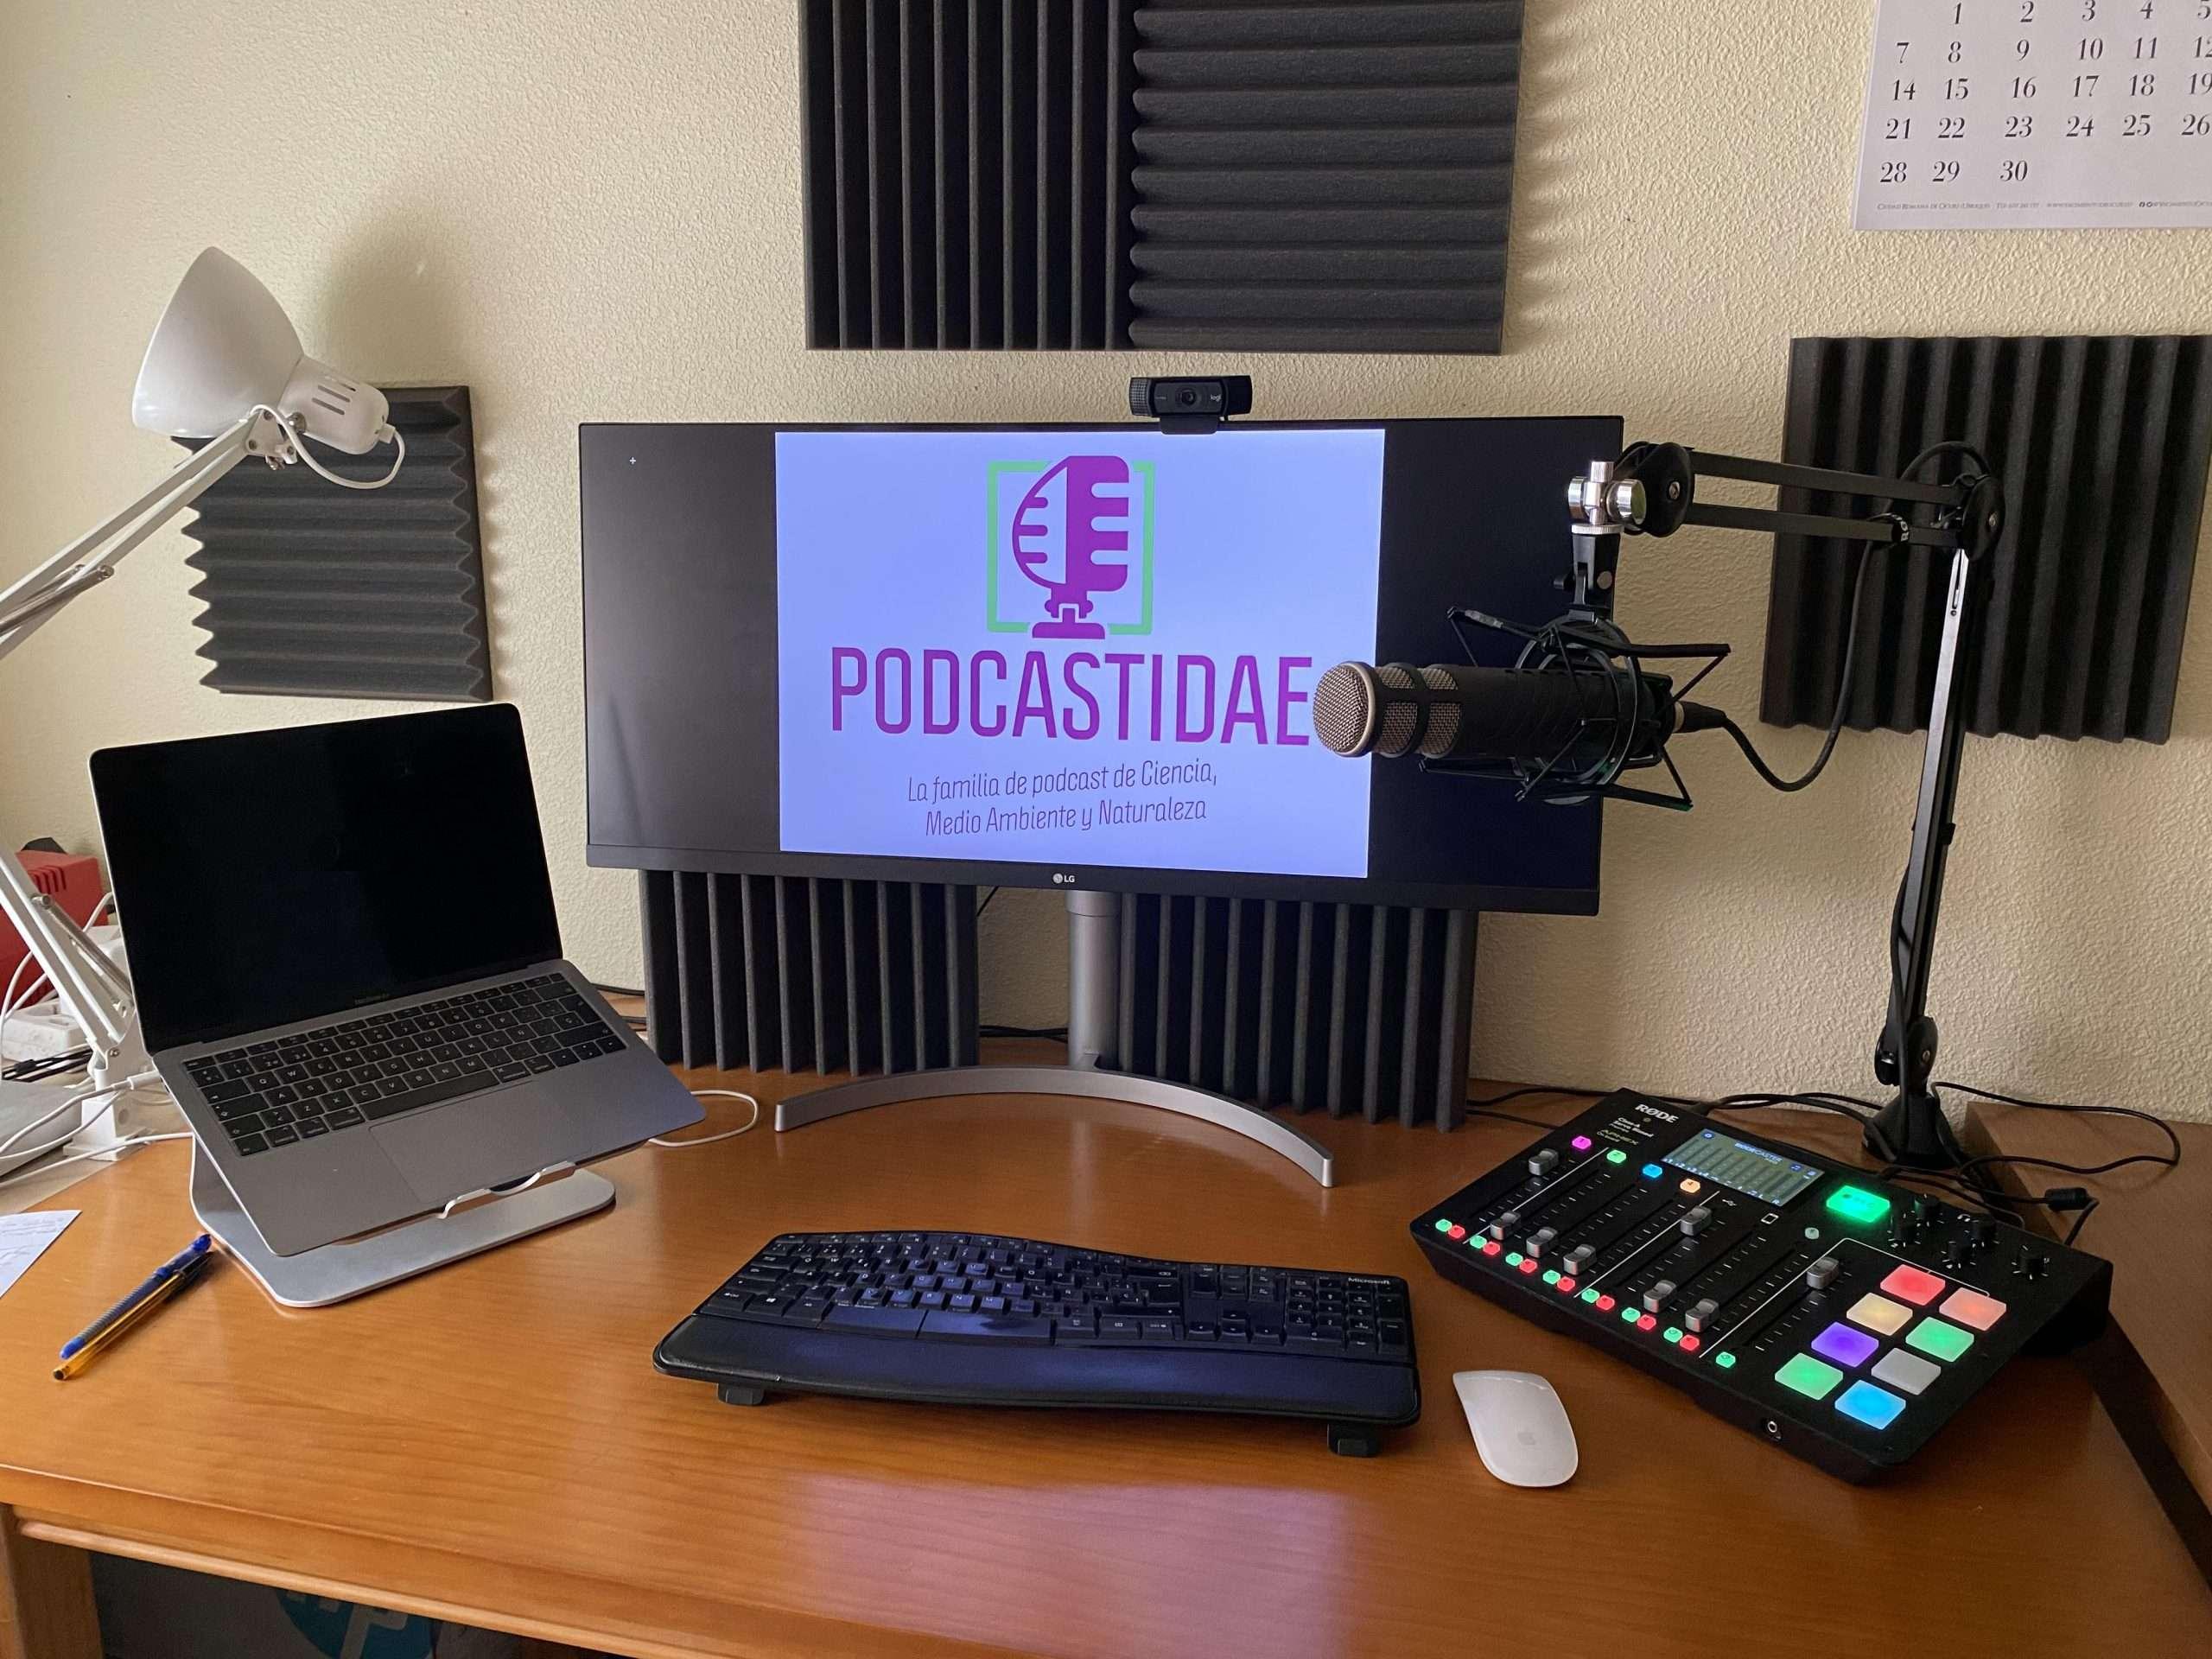 podcastidae